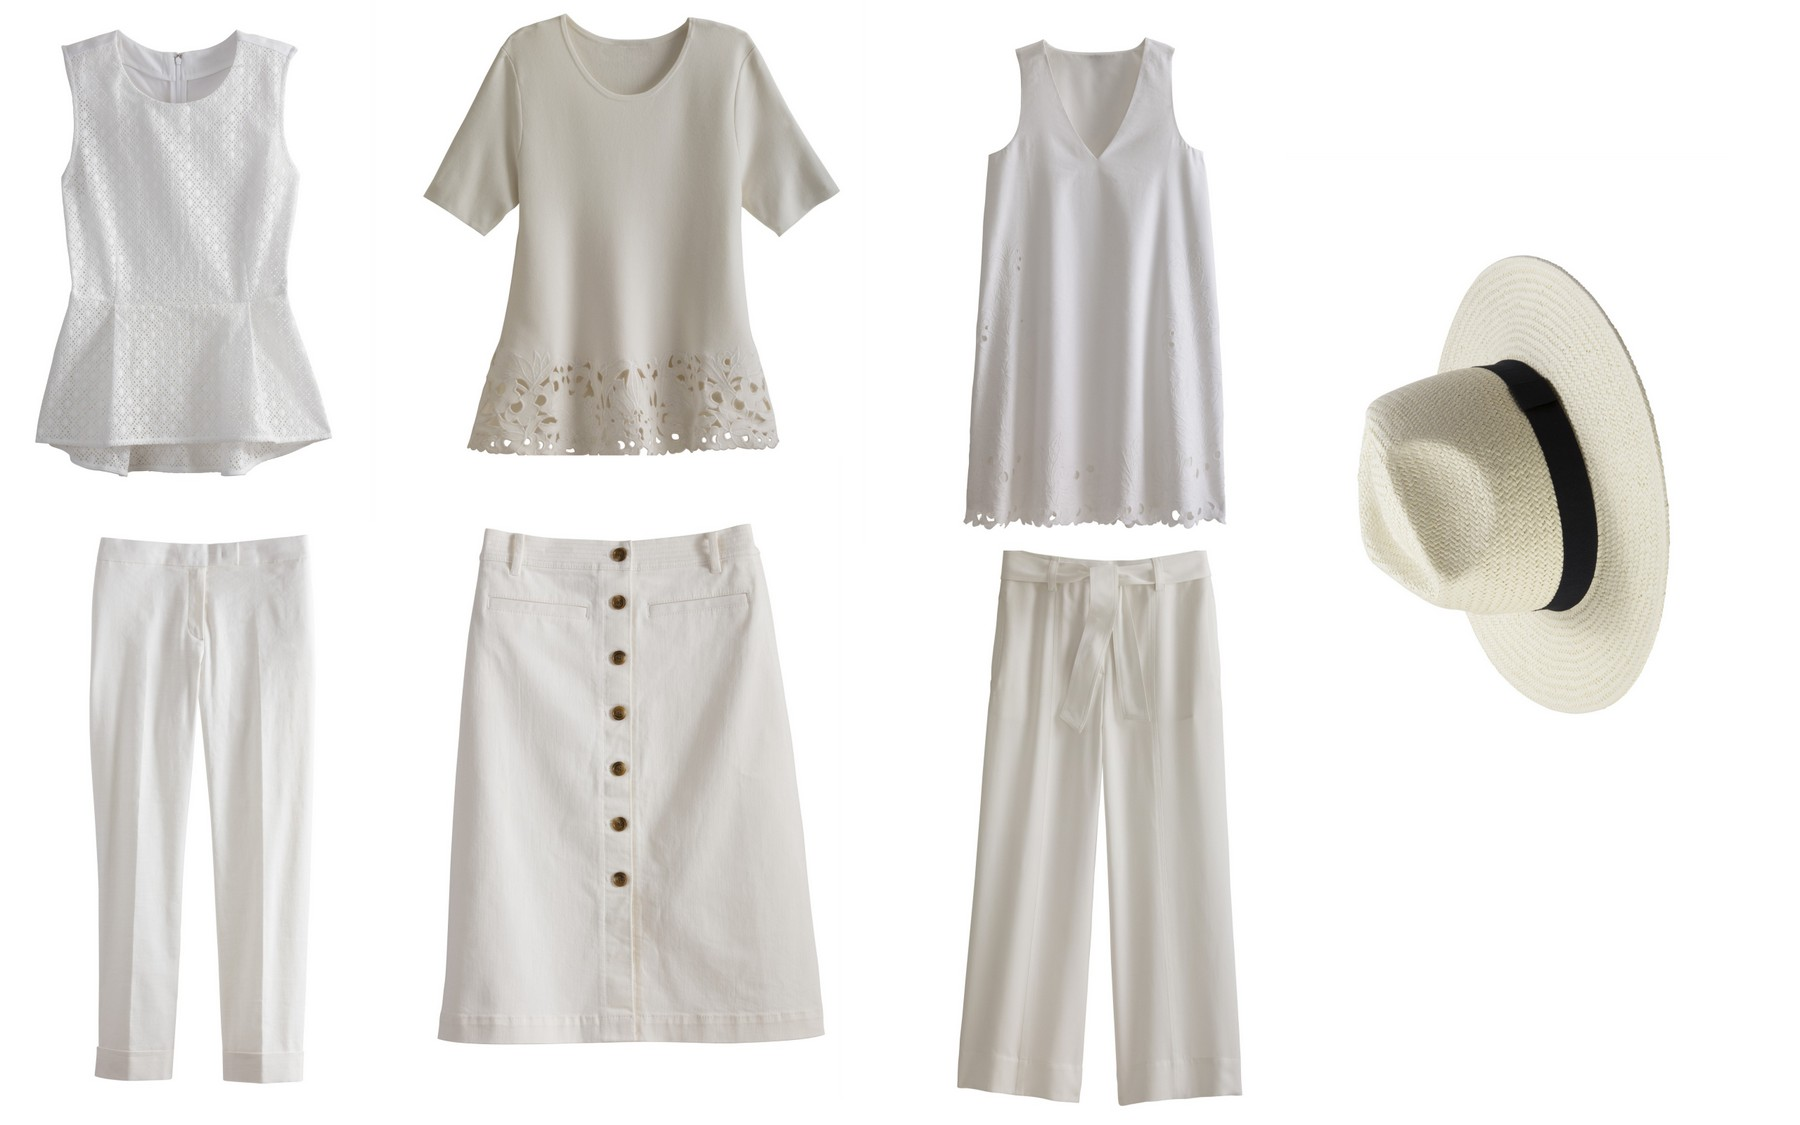 Summer Style: Crisp Whites from Ann Taylor